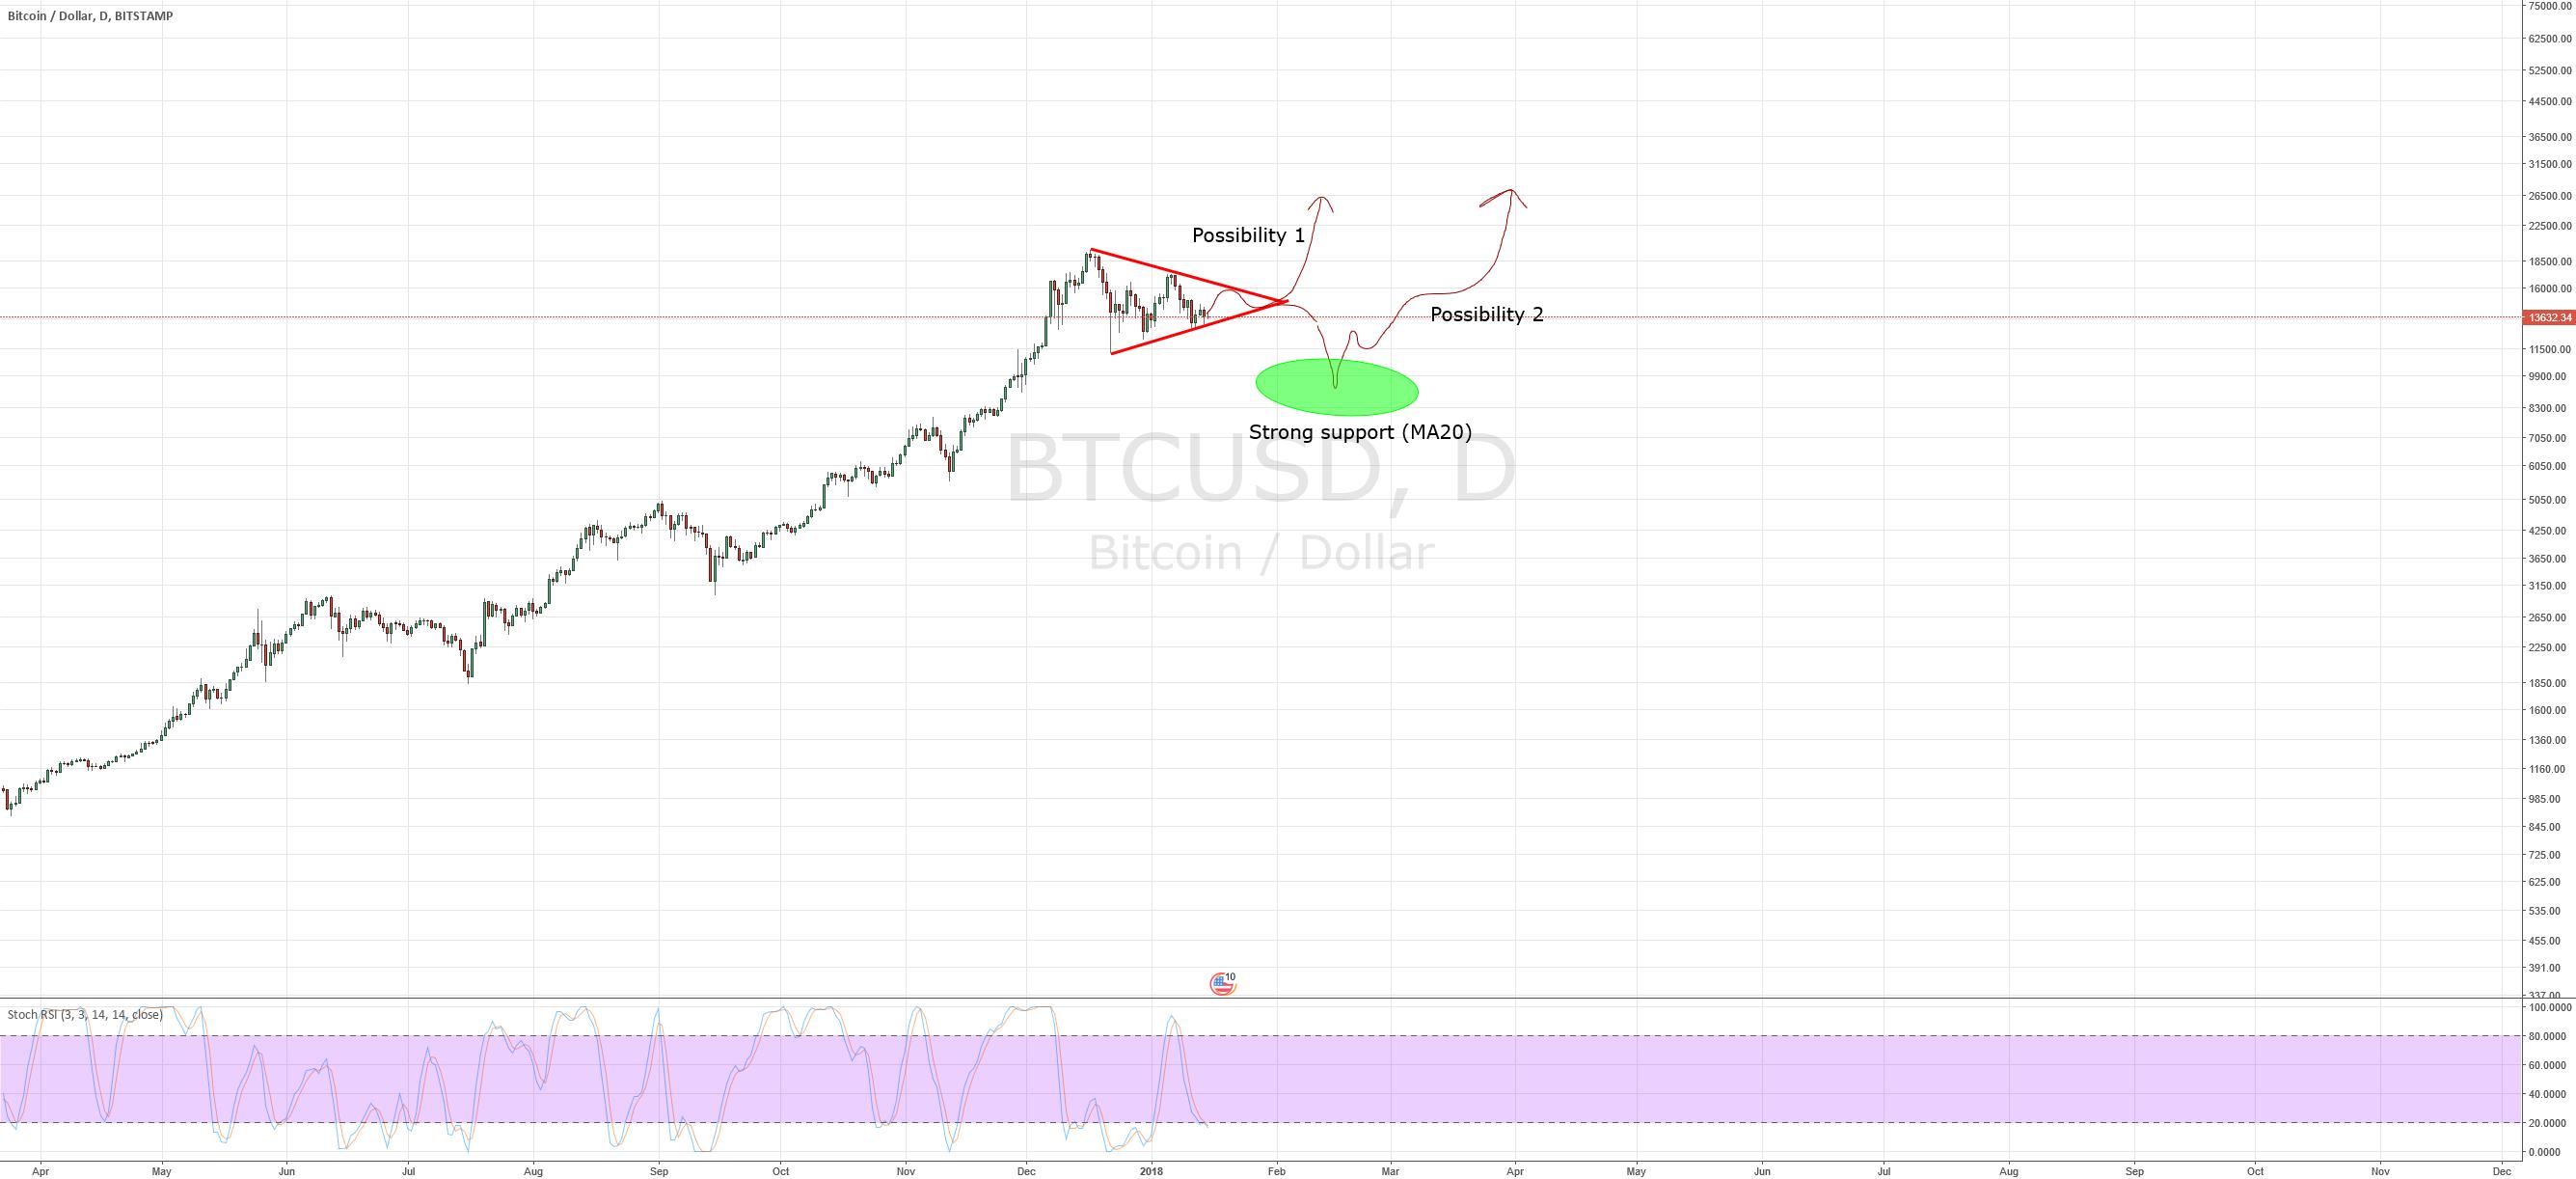 Two possible scenarios for BTC